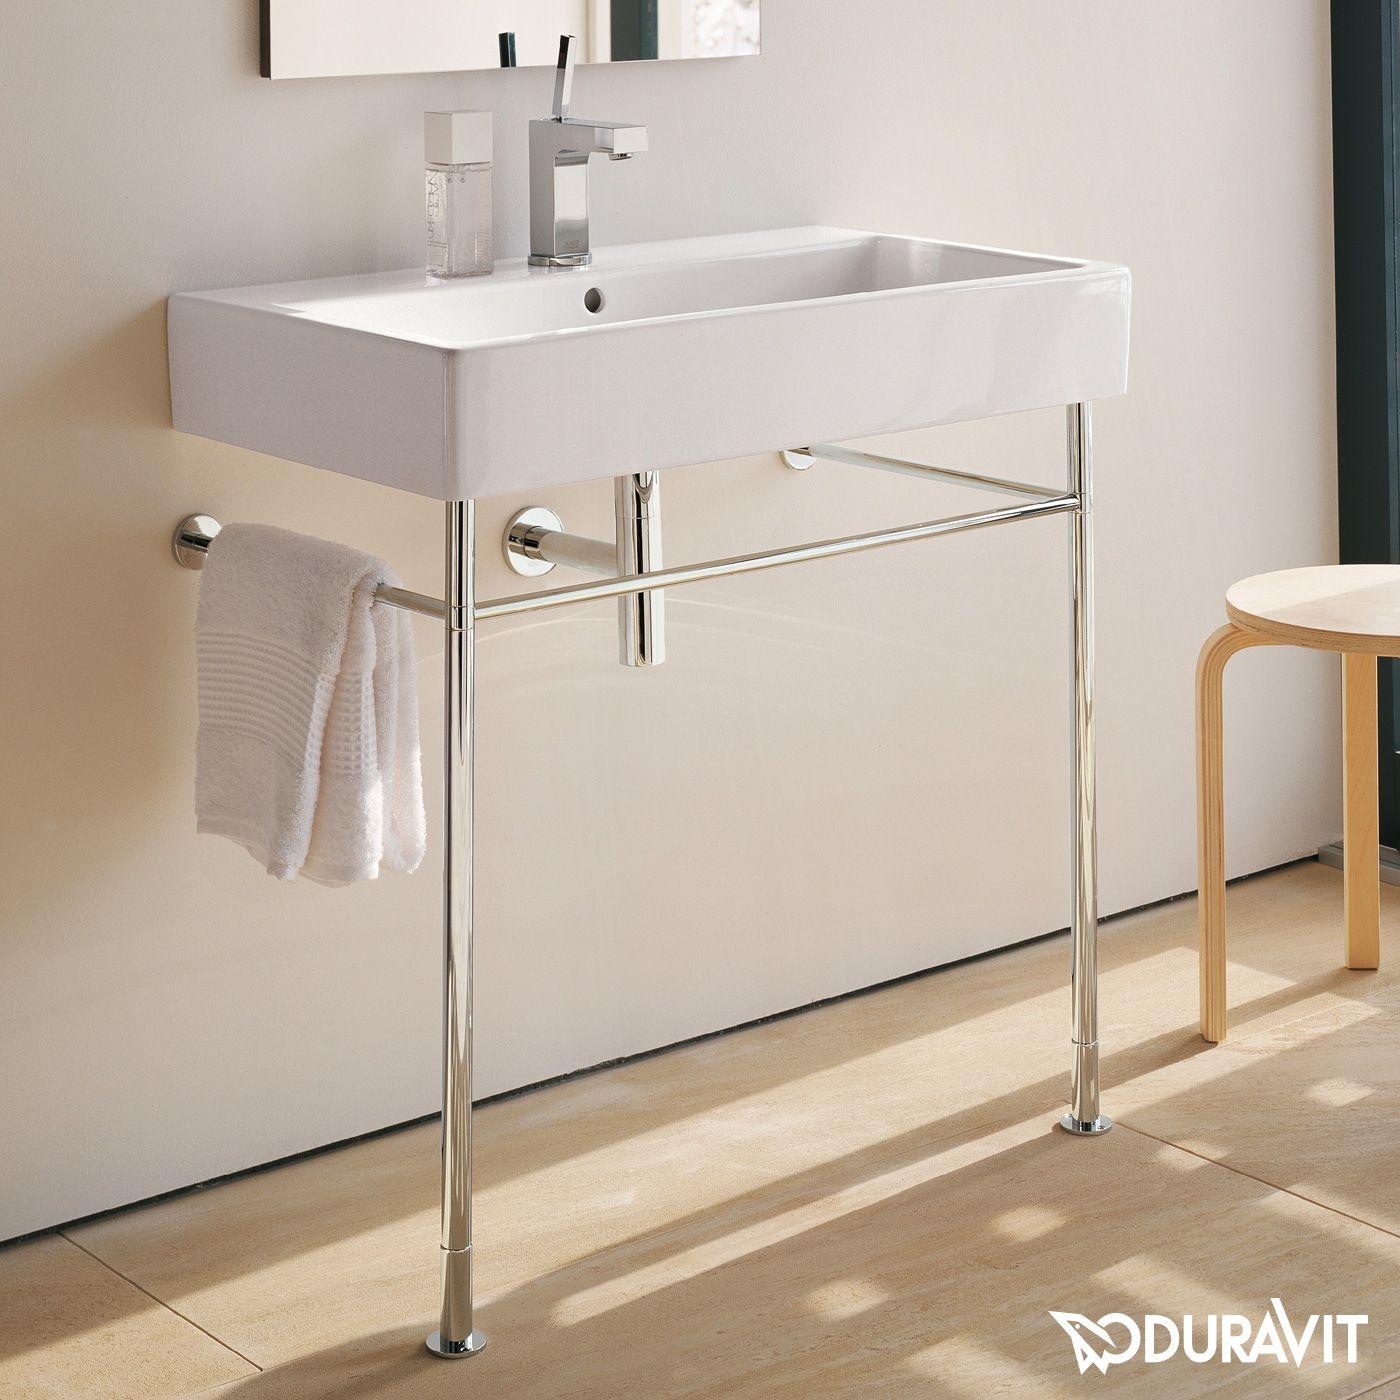 Duravit Vero metal console for washbasin